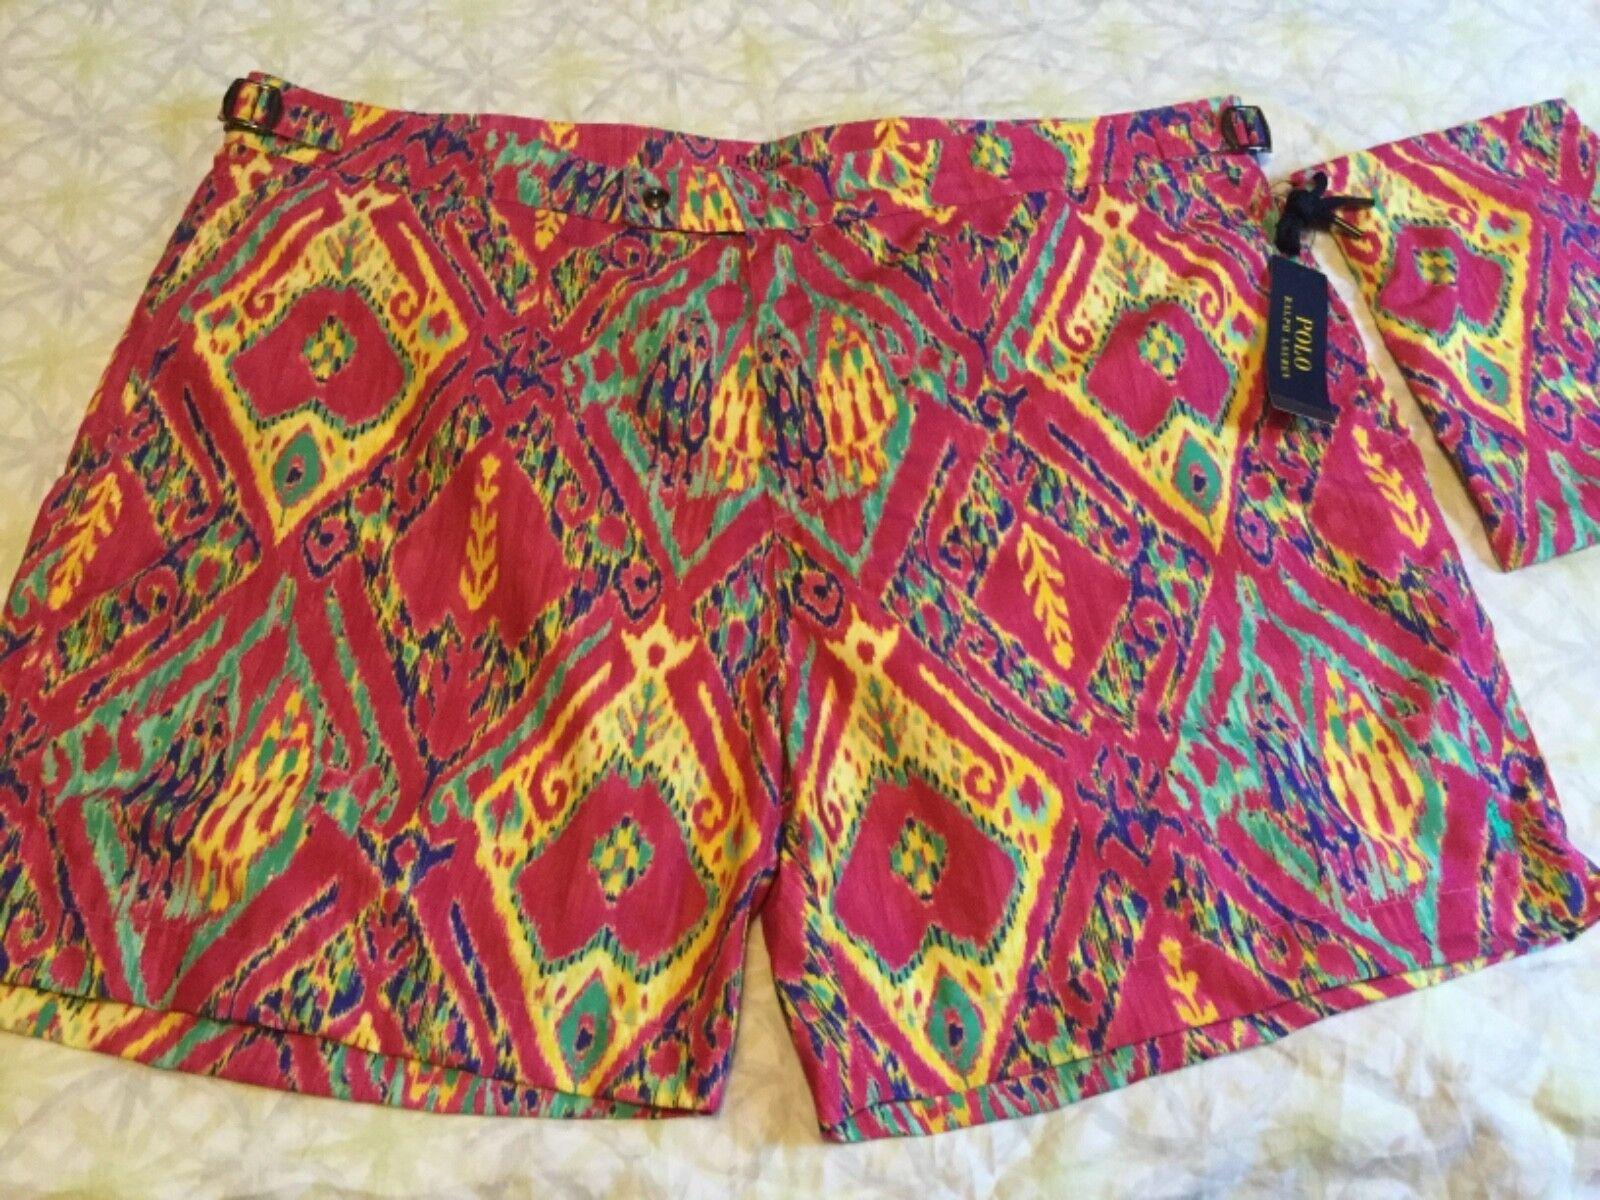 e923f2f3ab2e9 POLO RALPH LAUREN & Multi-color Print SWIM SUIT TRUNKS sz 42 NWT Magenta  nfvbdq259-Swimwear